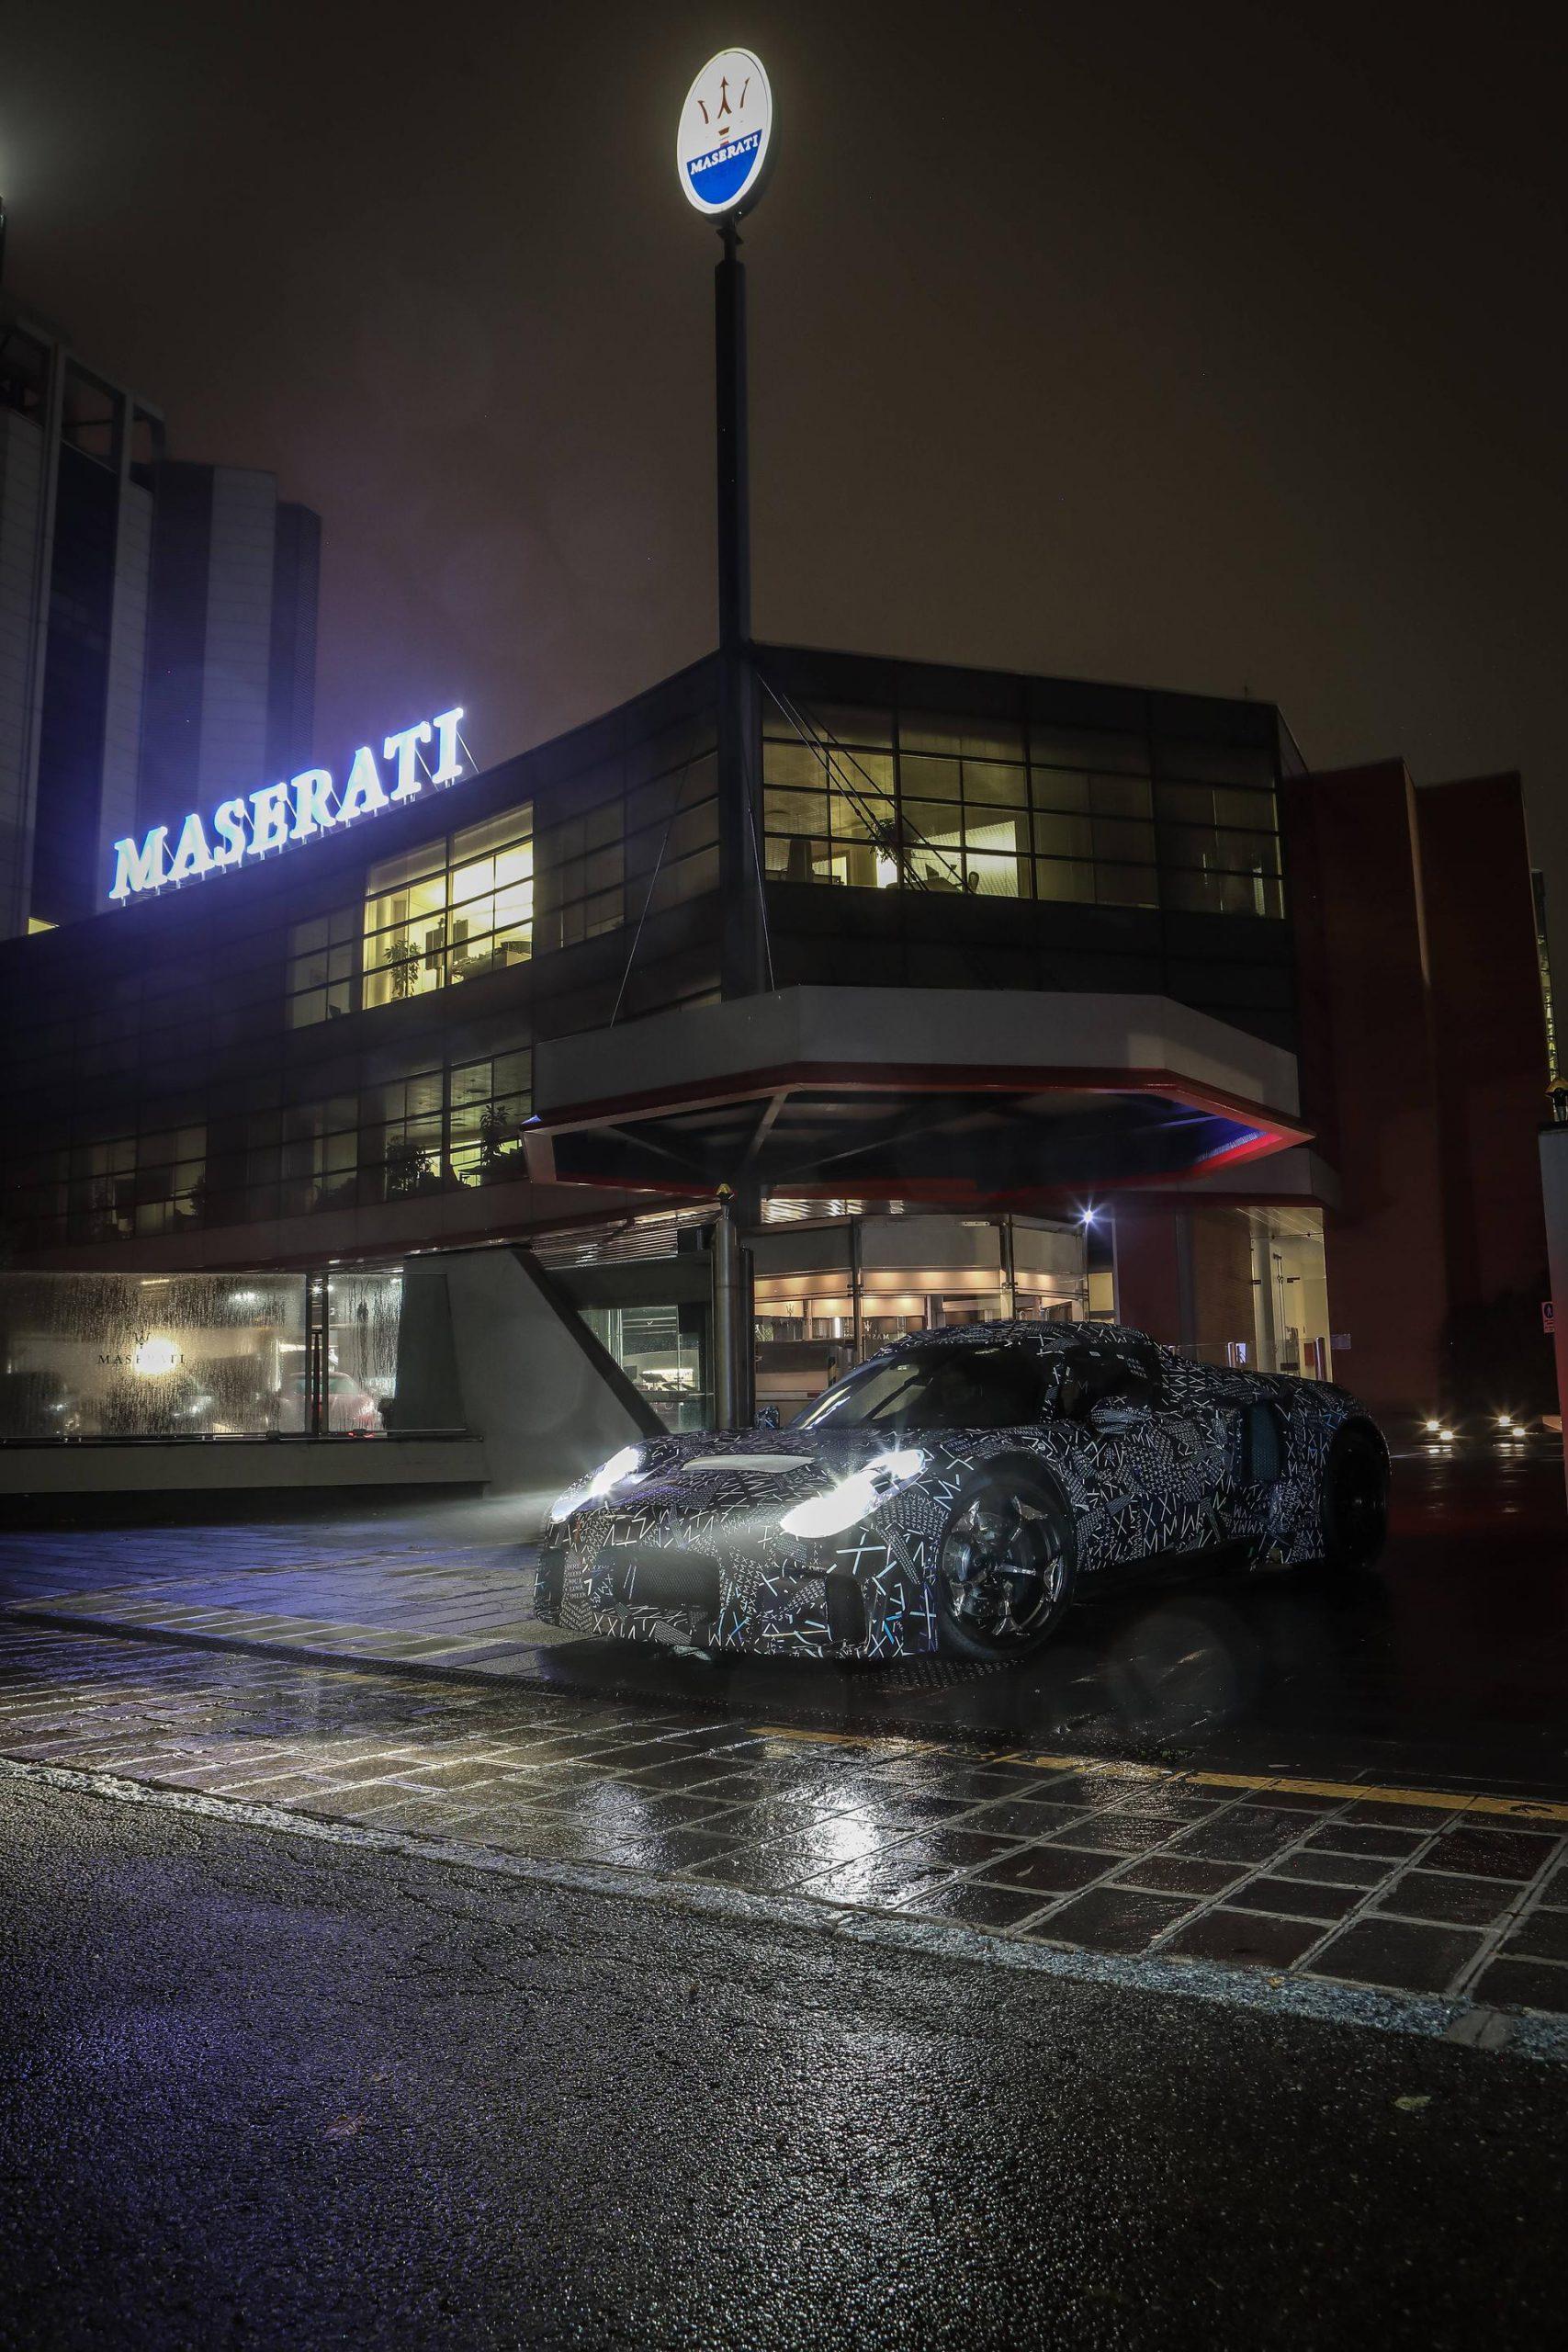 Nieuwe gecamoufleerde Maserati gespot in Modena: